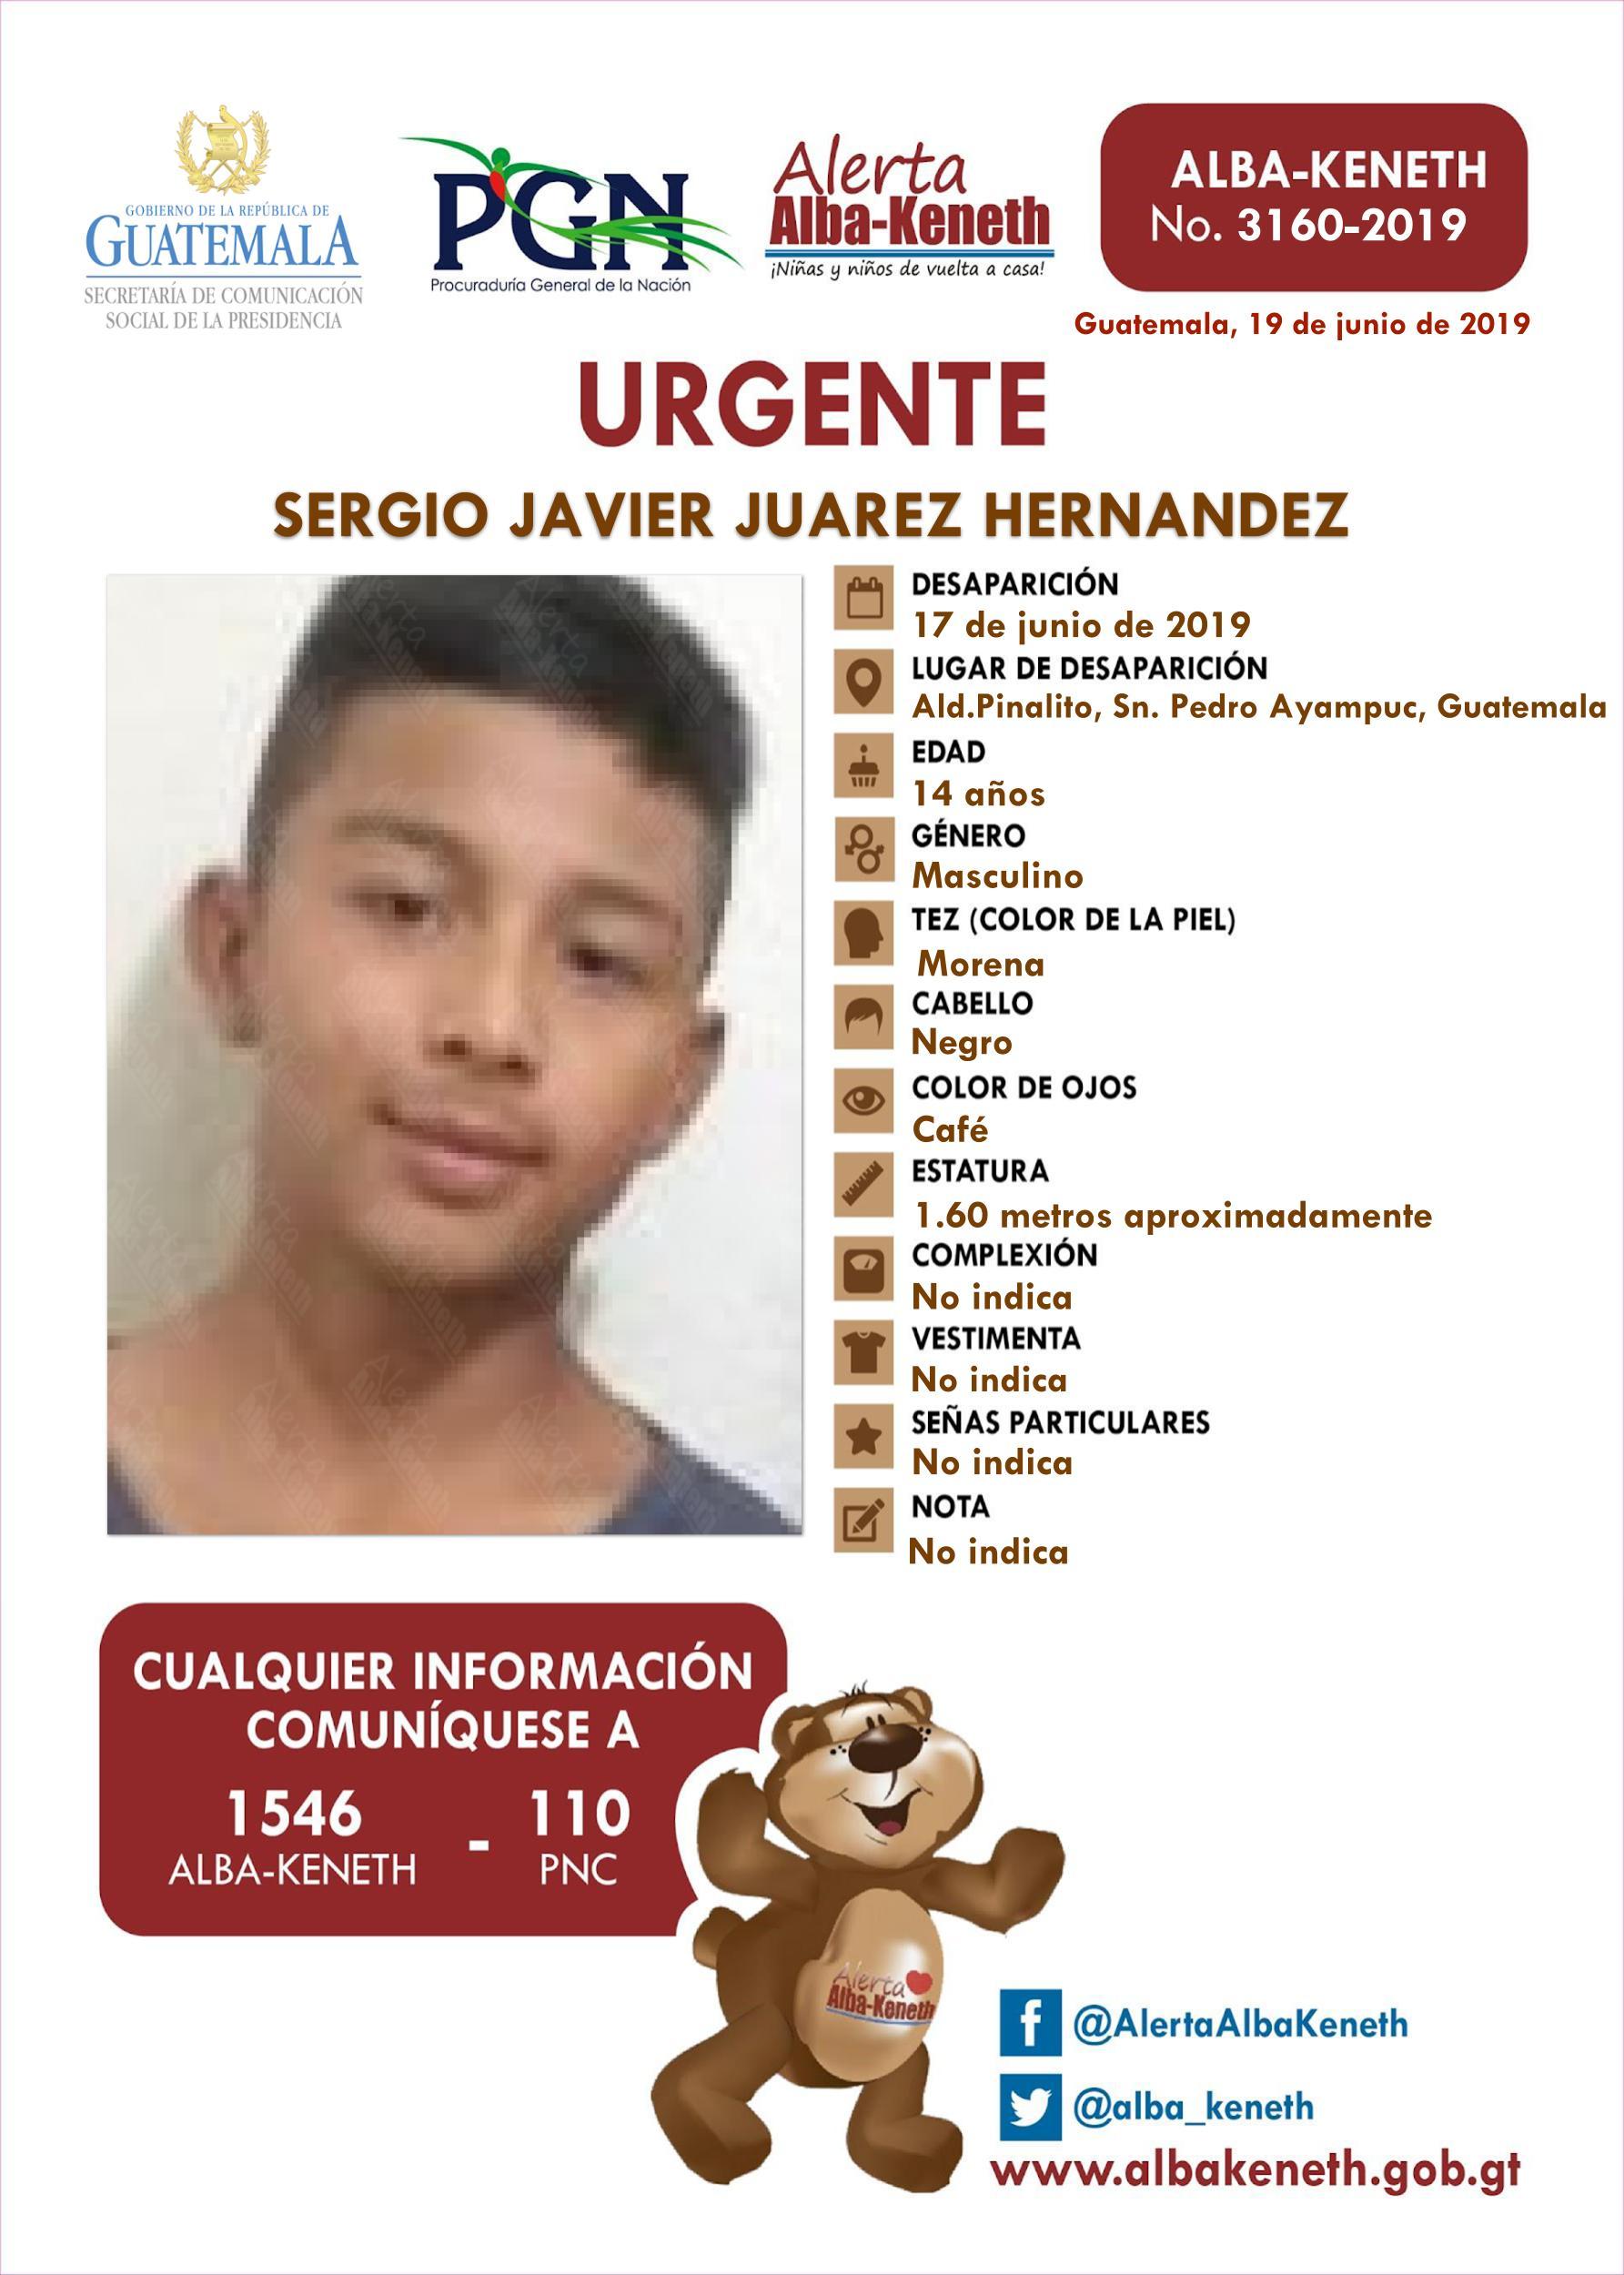 Sergio Javier Juarez Hernandez